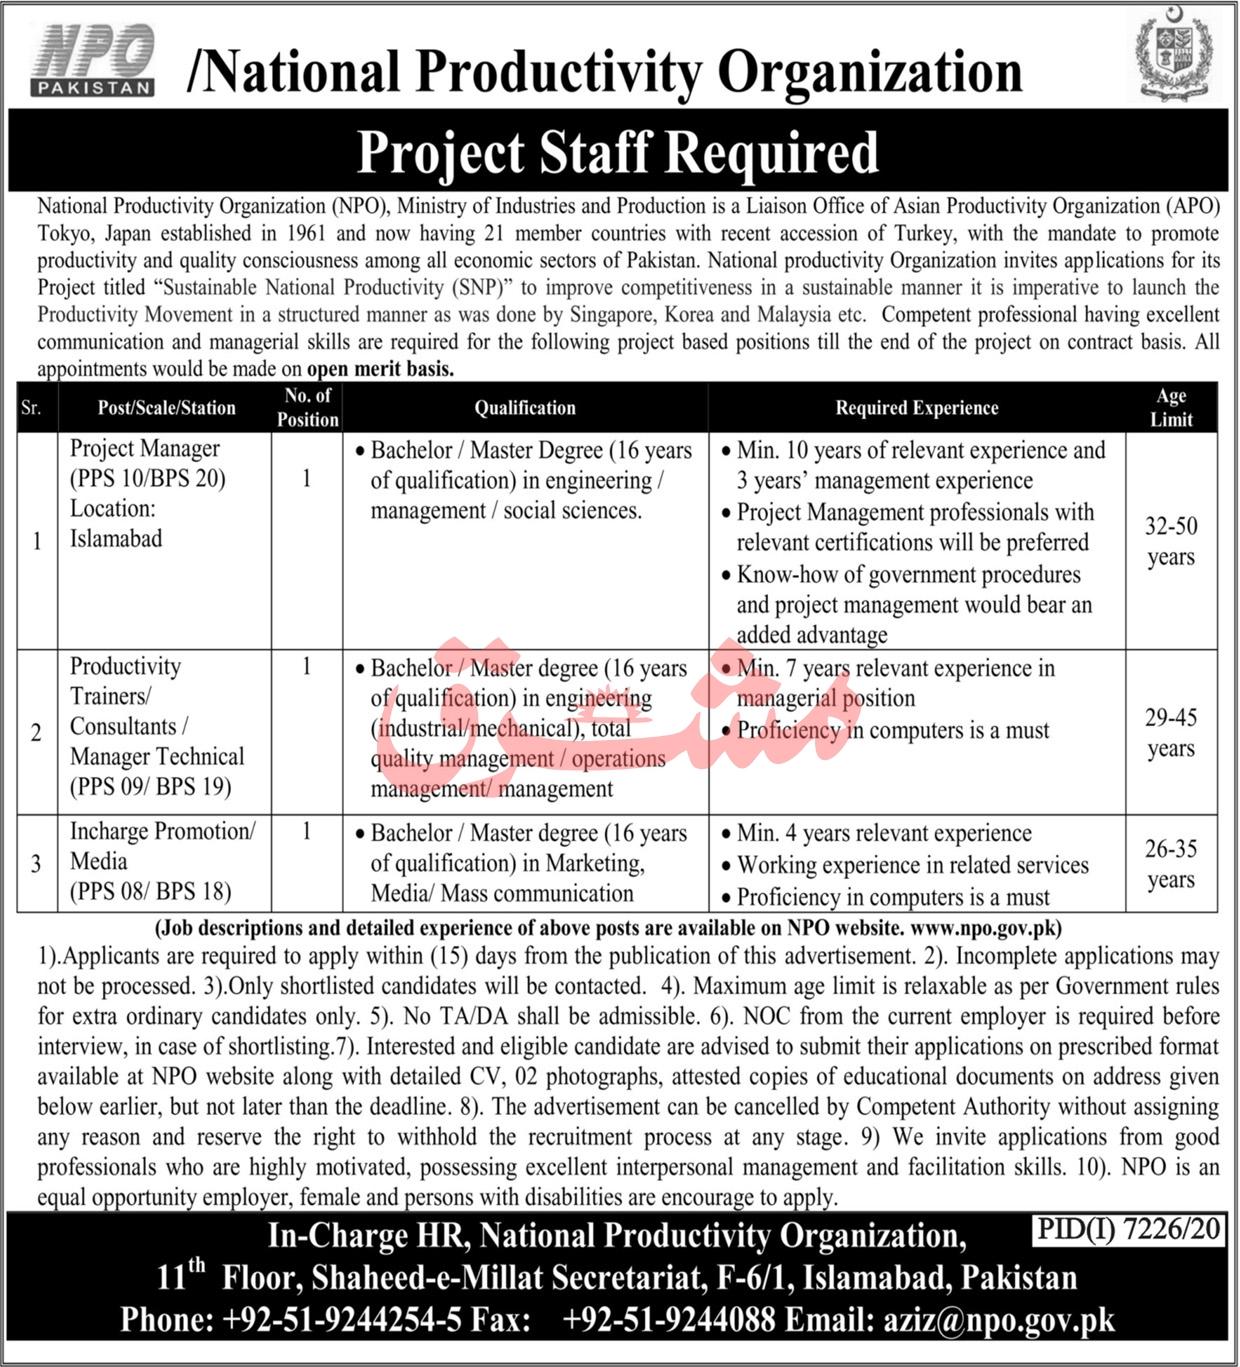 www.npo.gov.pk Jobs 2021 - National Productivity Organization (NPO) Jobs 2021 in Pakistan